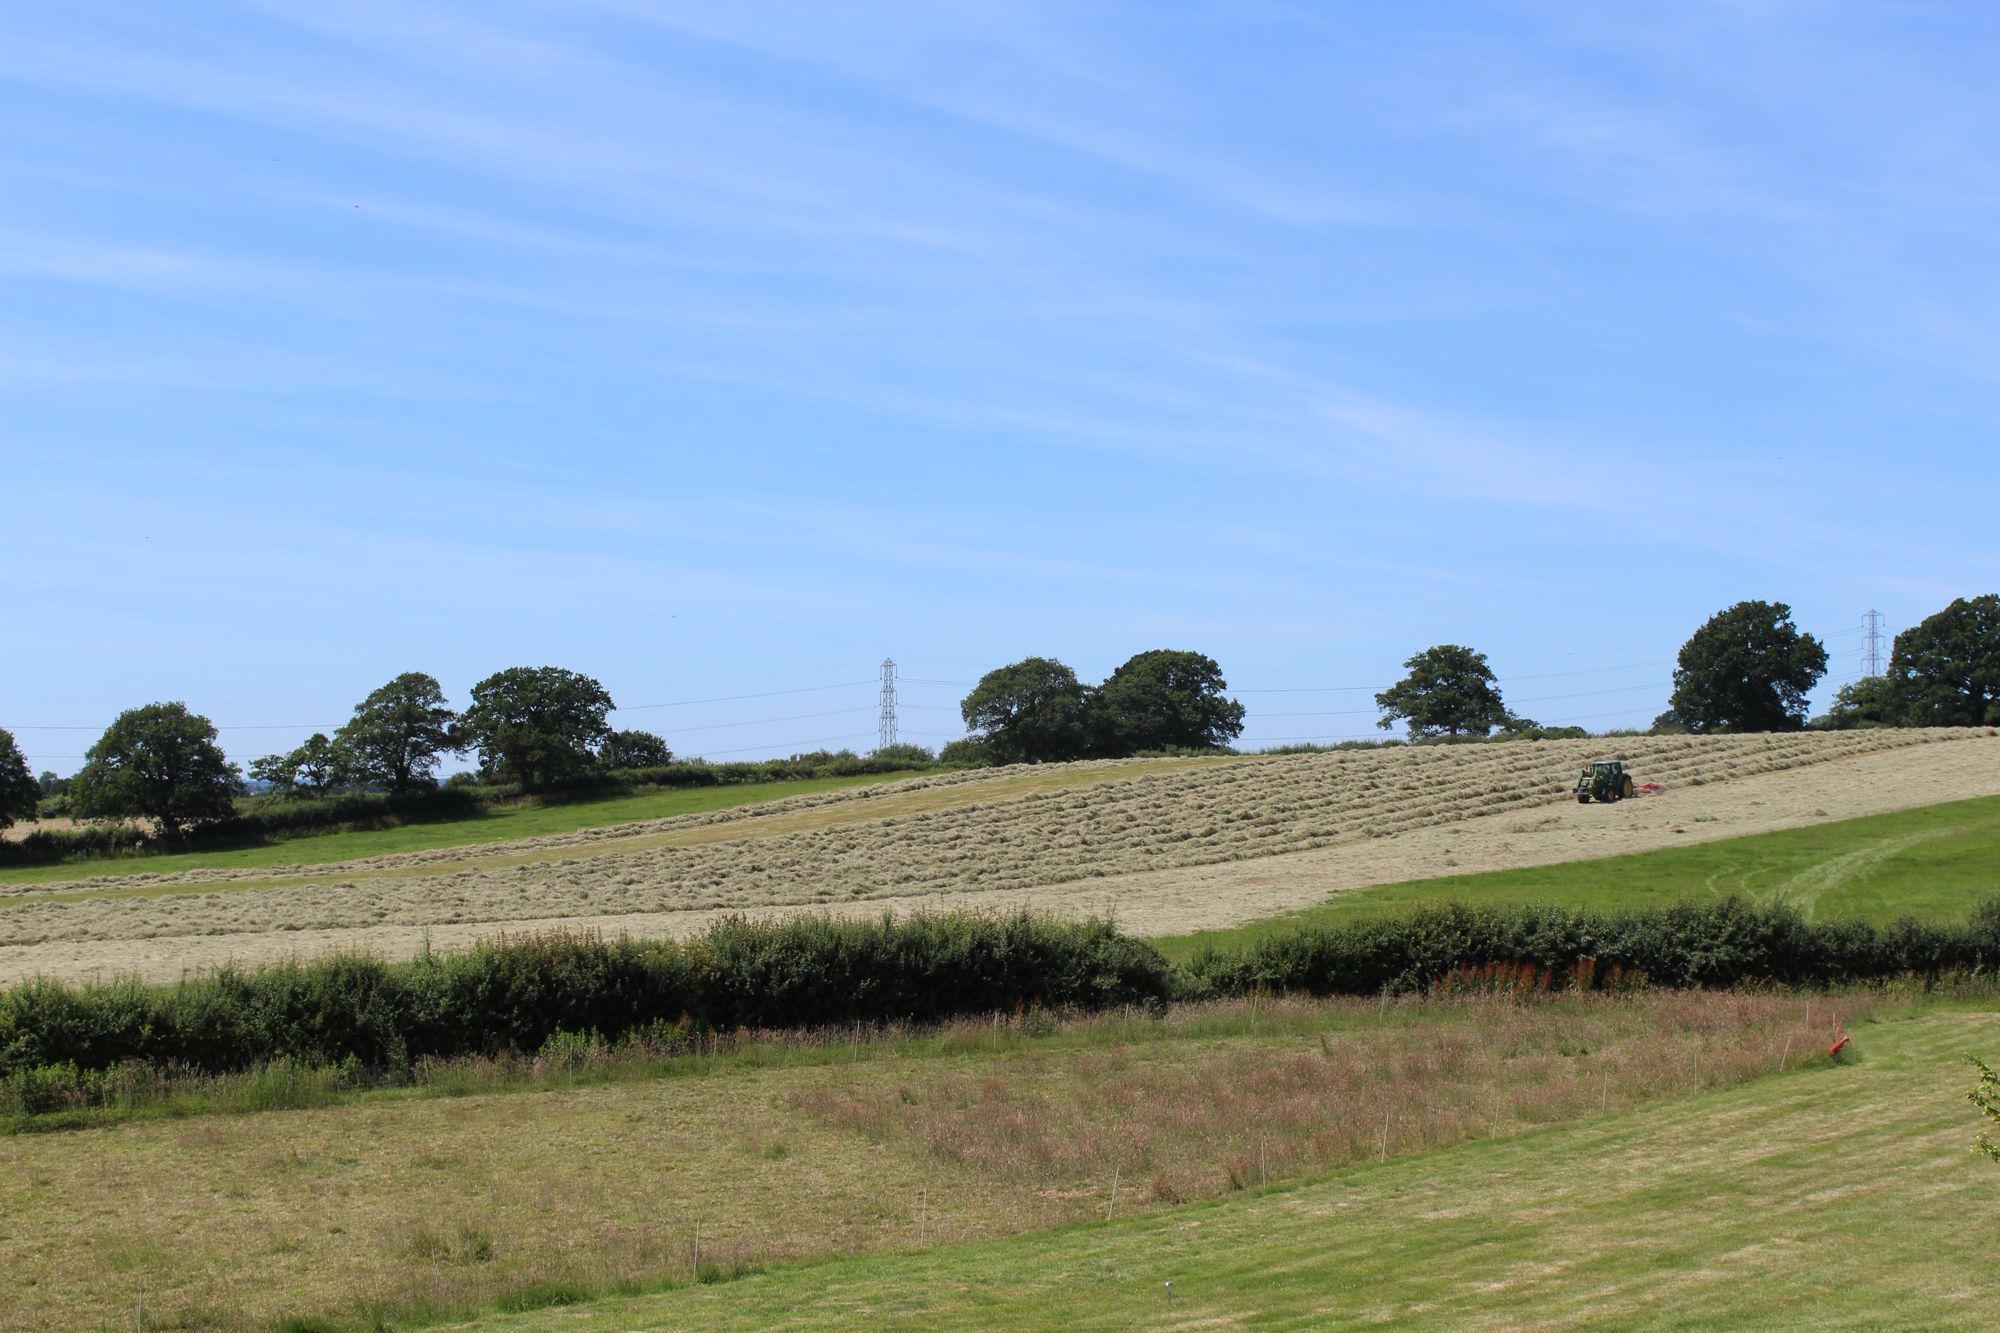 Malmesbury Camping | Campsites Near Malmesbury, Wiltshire